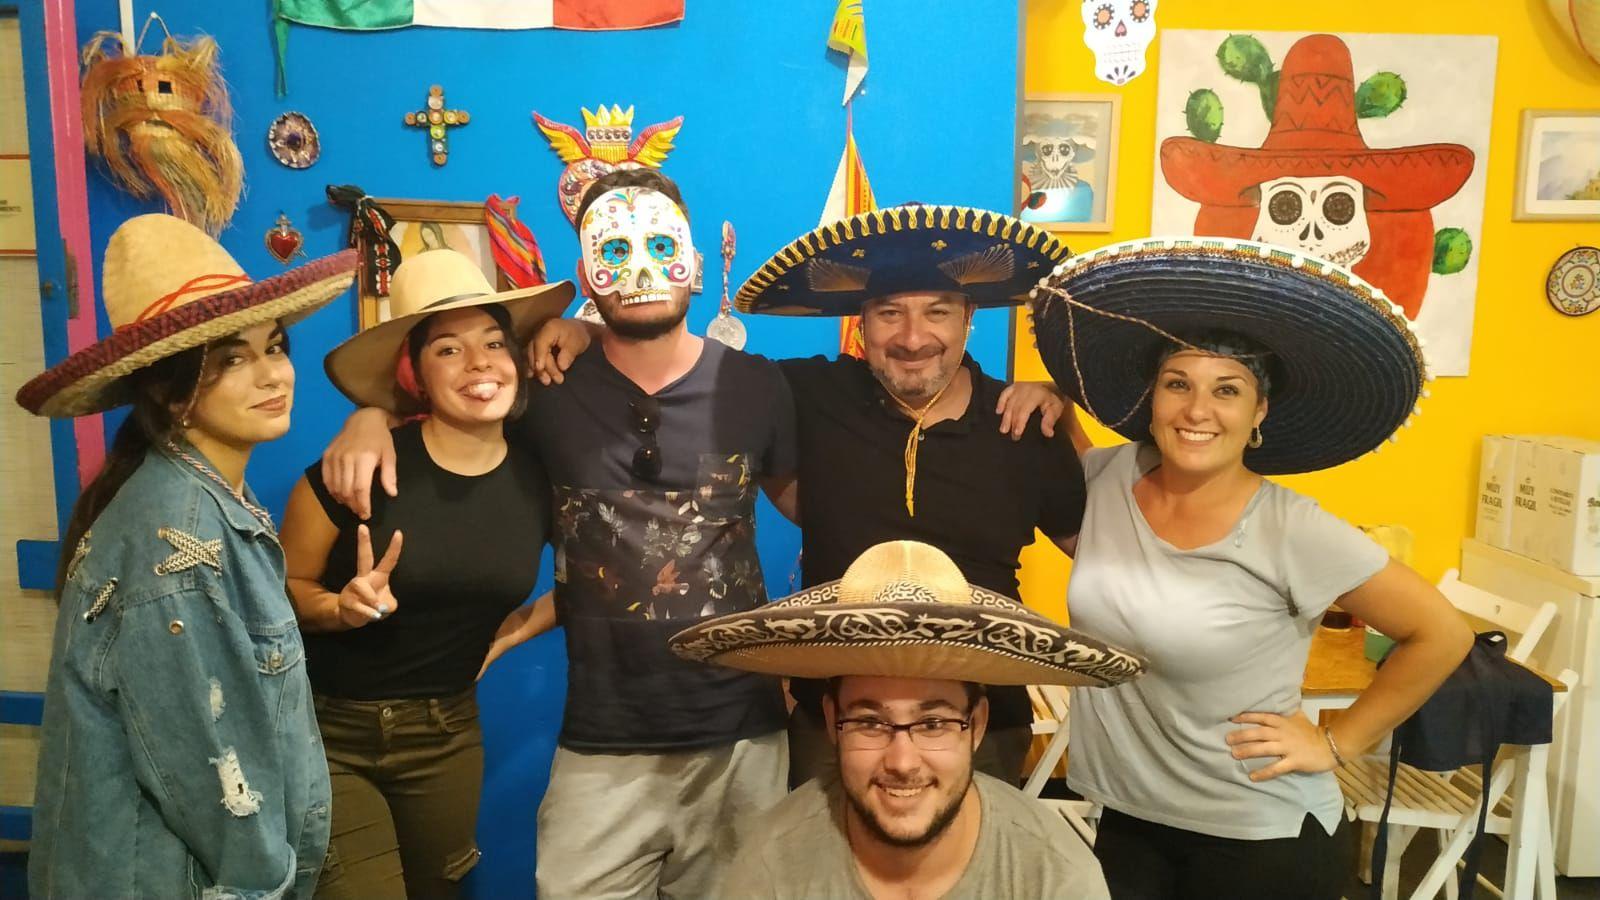 Foto 26 de Restaurante mexicano en  | Cantina La Catrina